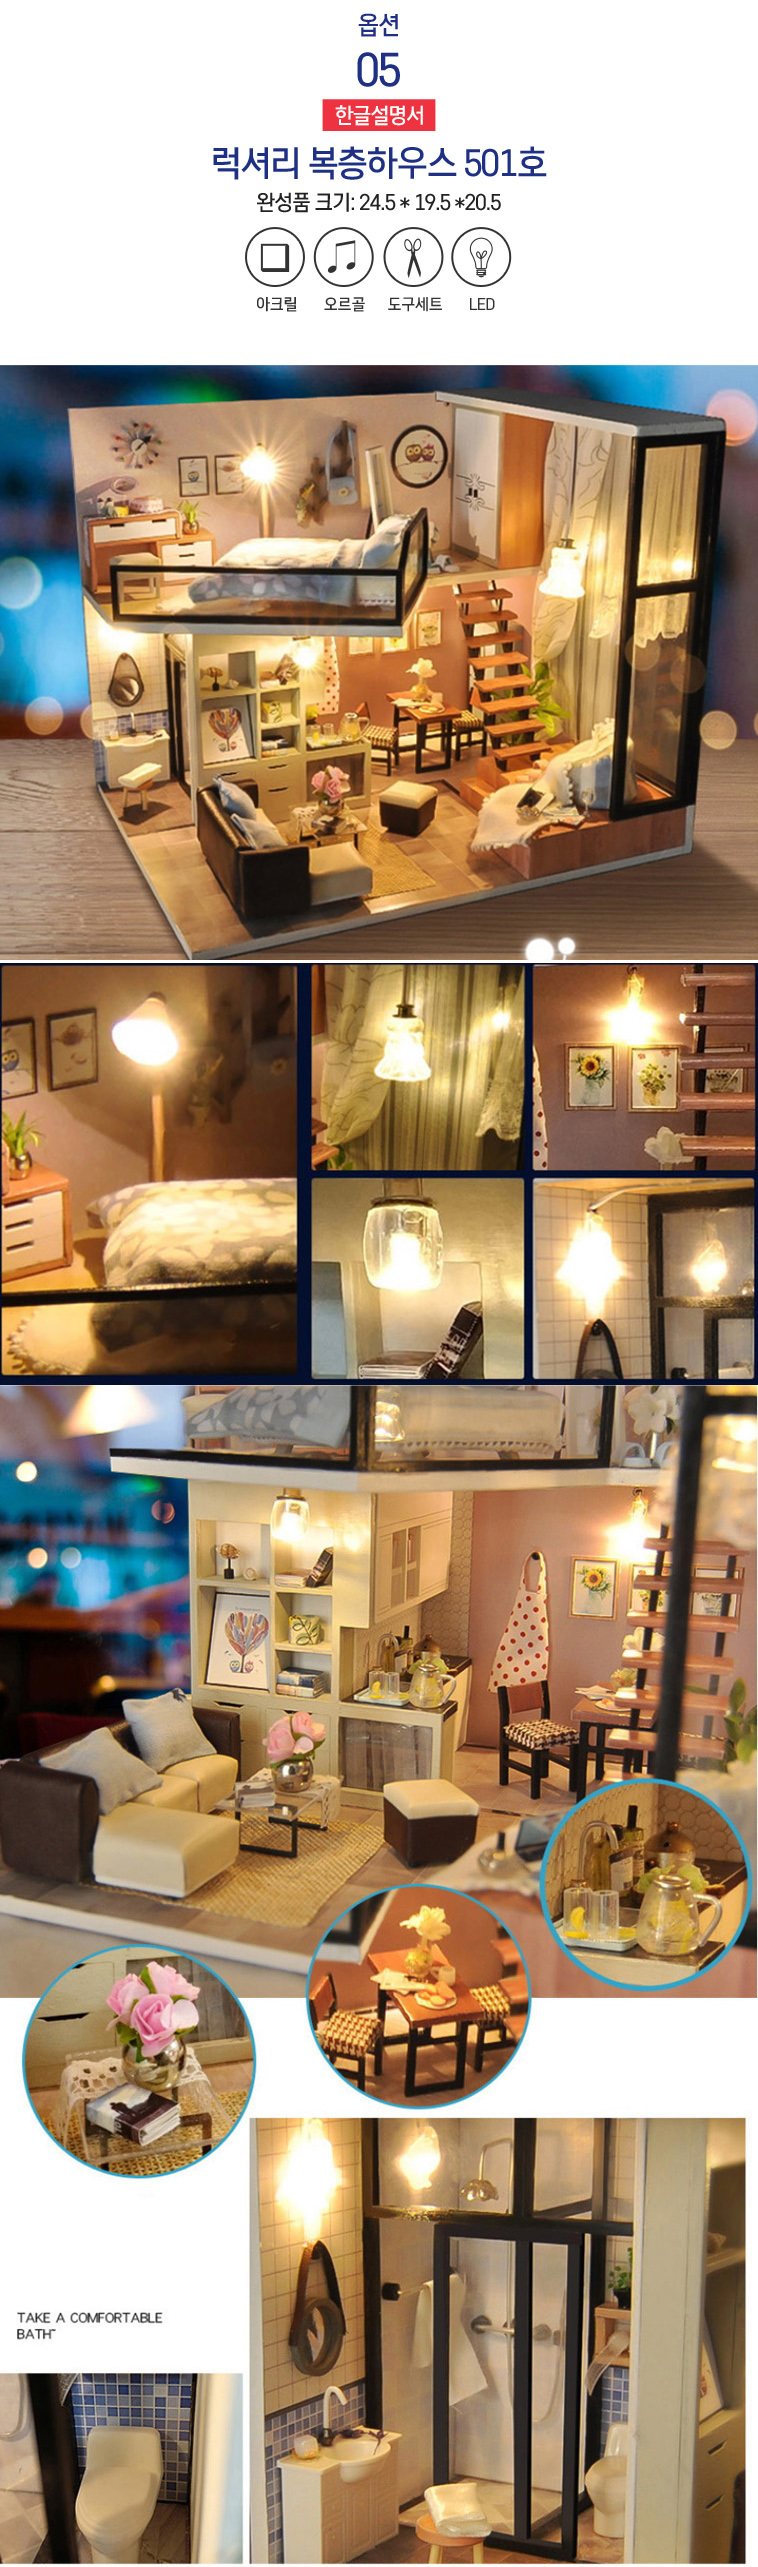 DIY 미니어쳐 하우스 만들기 럭셔리복층하우스501호 - 옥탑방어른이, 24,980원, 미니어처 DIY, 미니어처 만들기 패키지